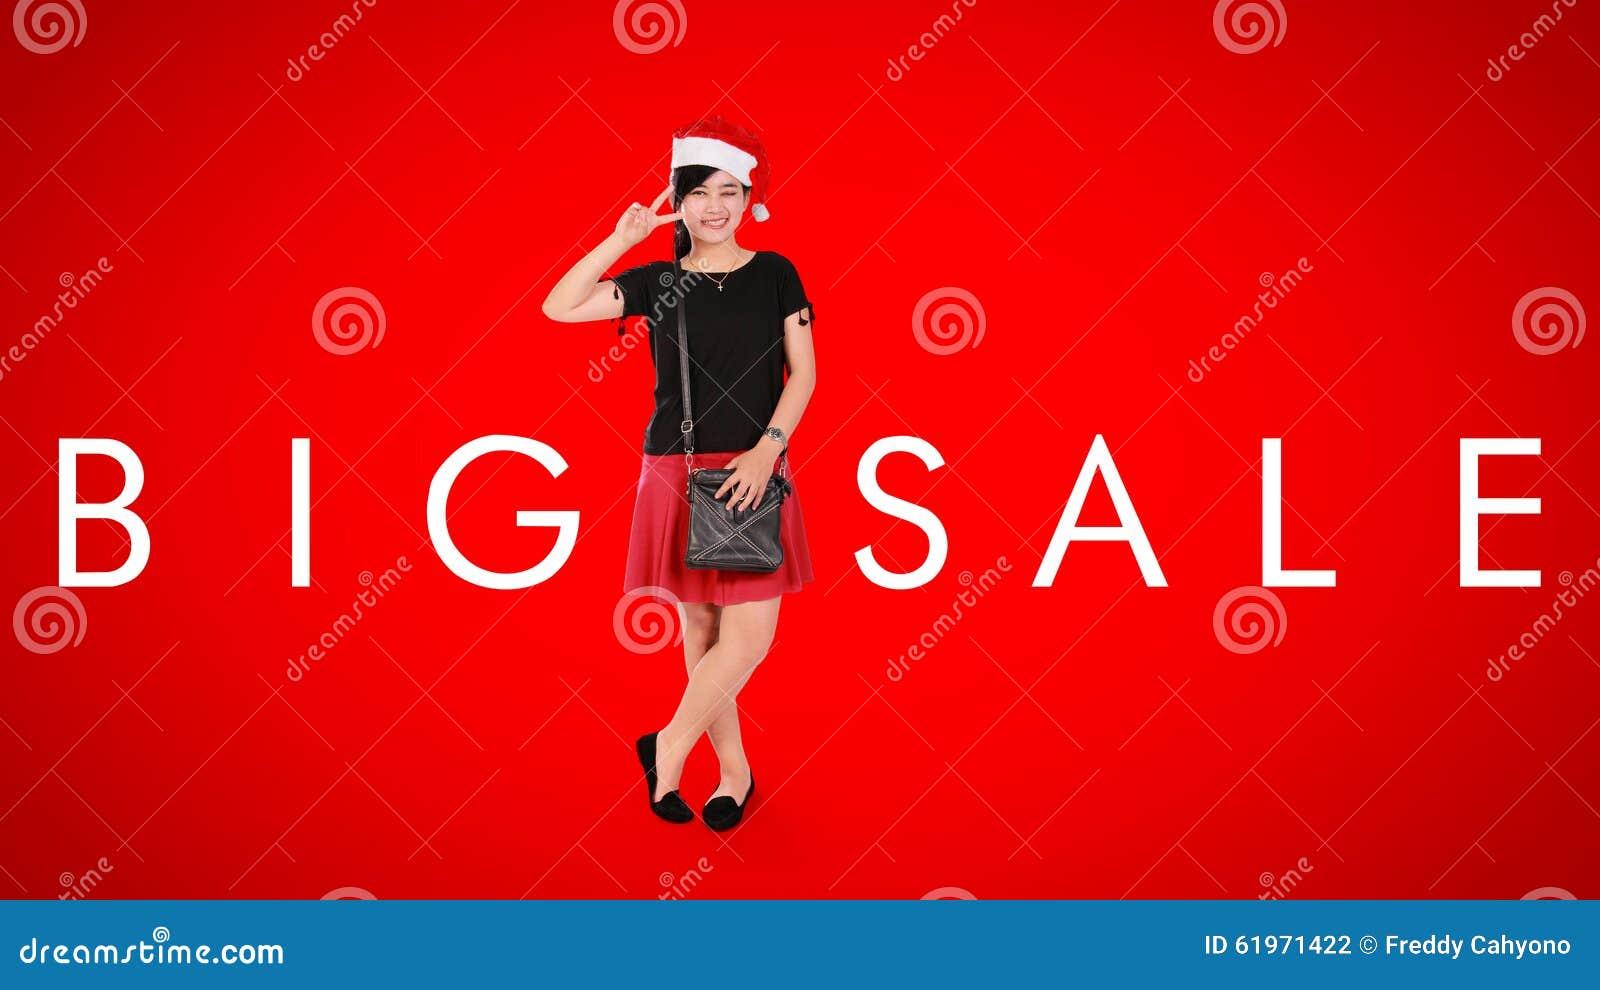 Big sale christmas ad background stock illustration for Minimalist christmas